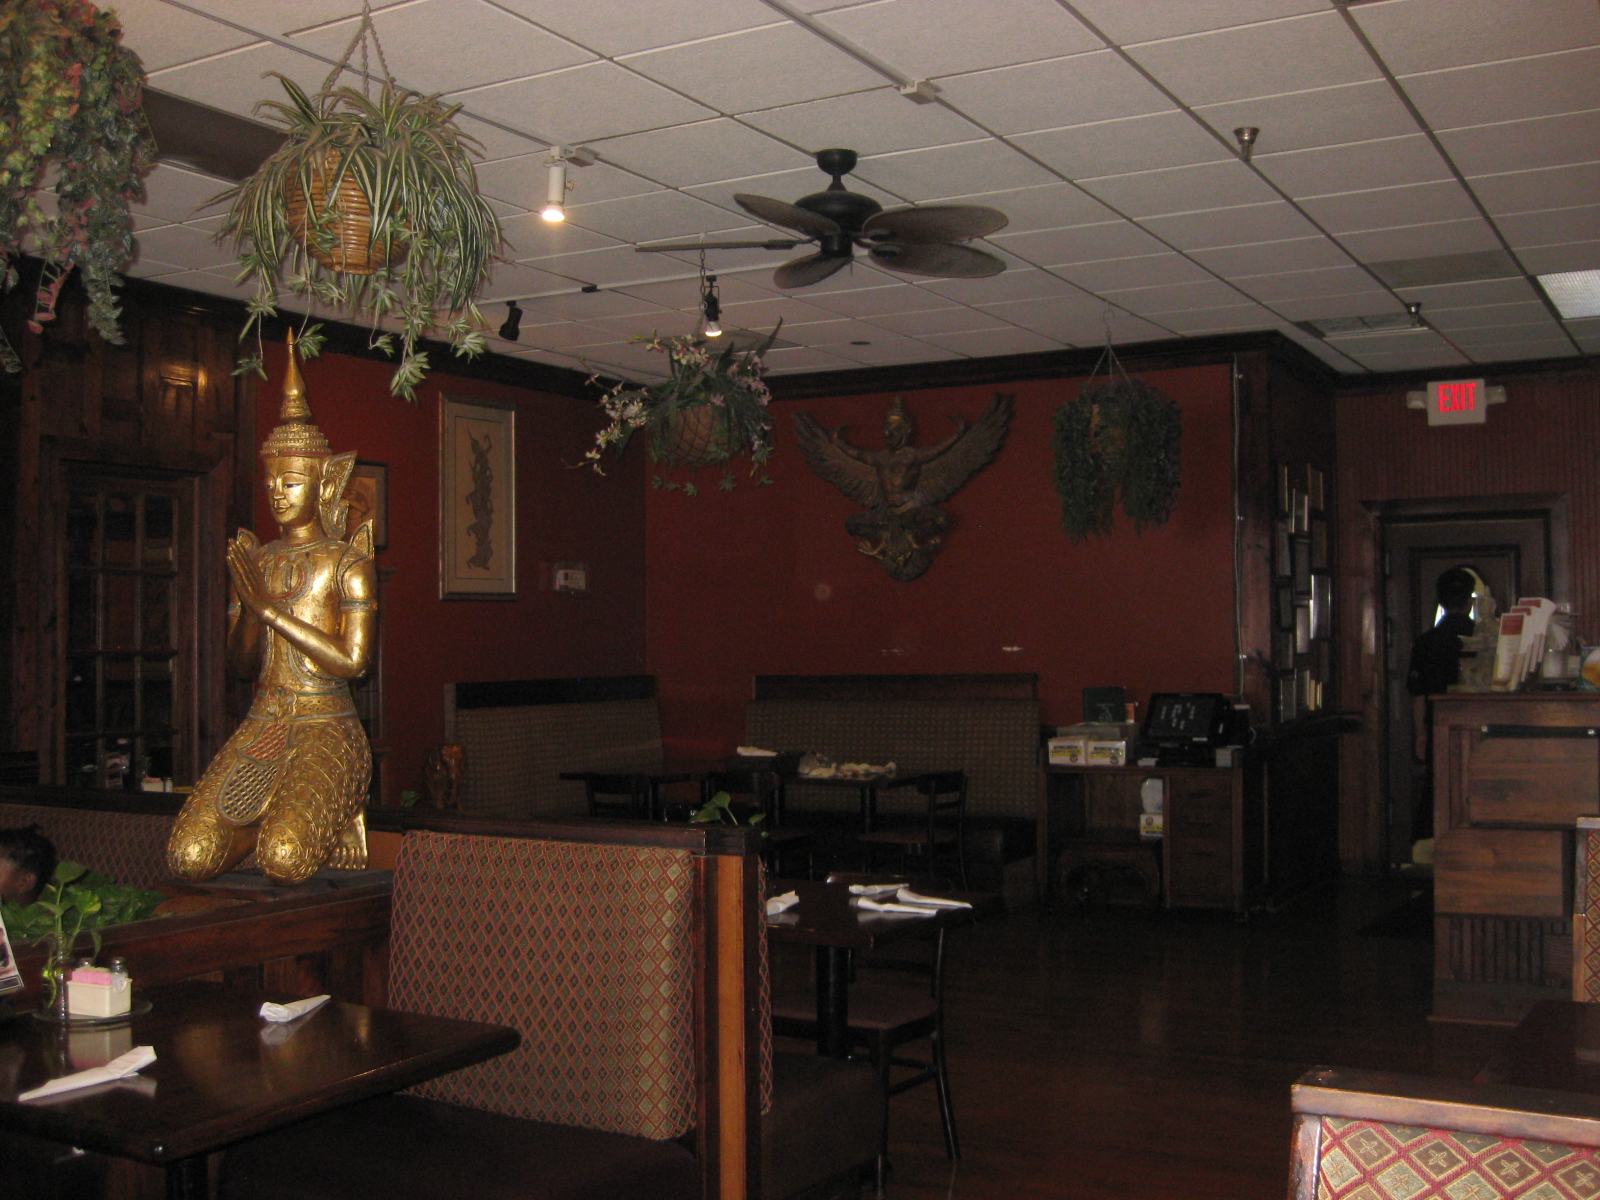 Northern Virginia Restaurant Blog When You 39 Re In Hampton Roads Va Ya Gotta Eat At These Two